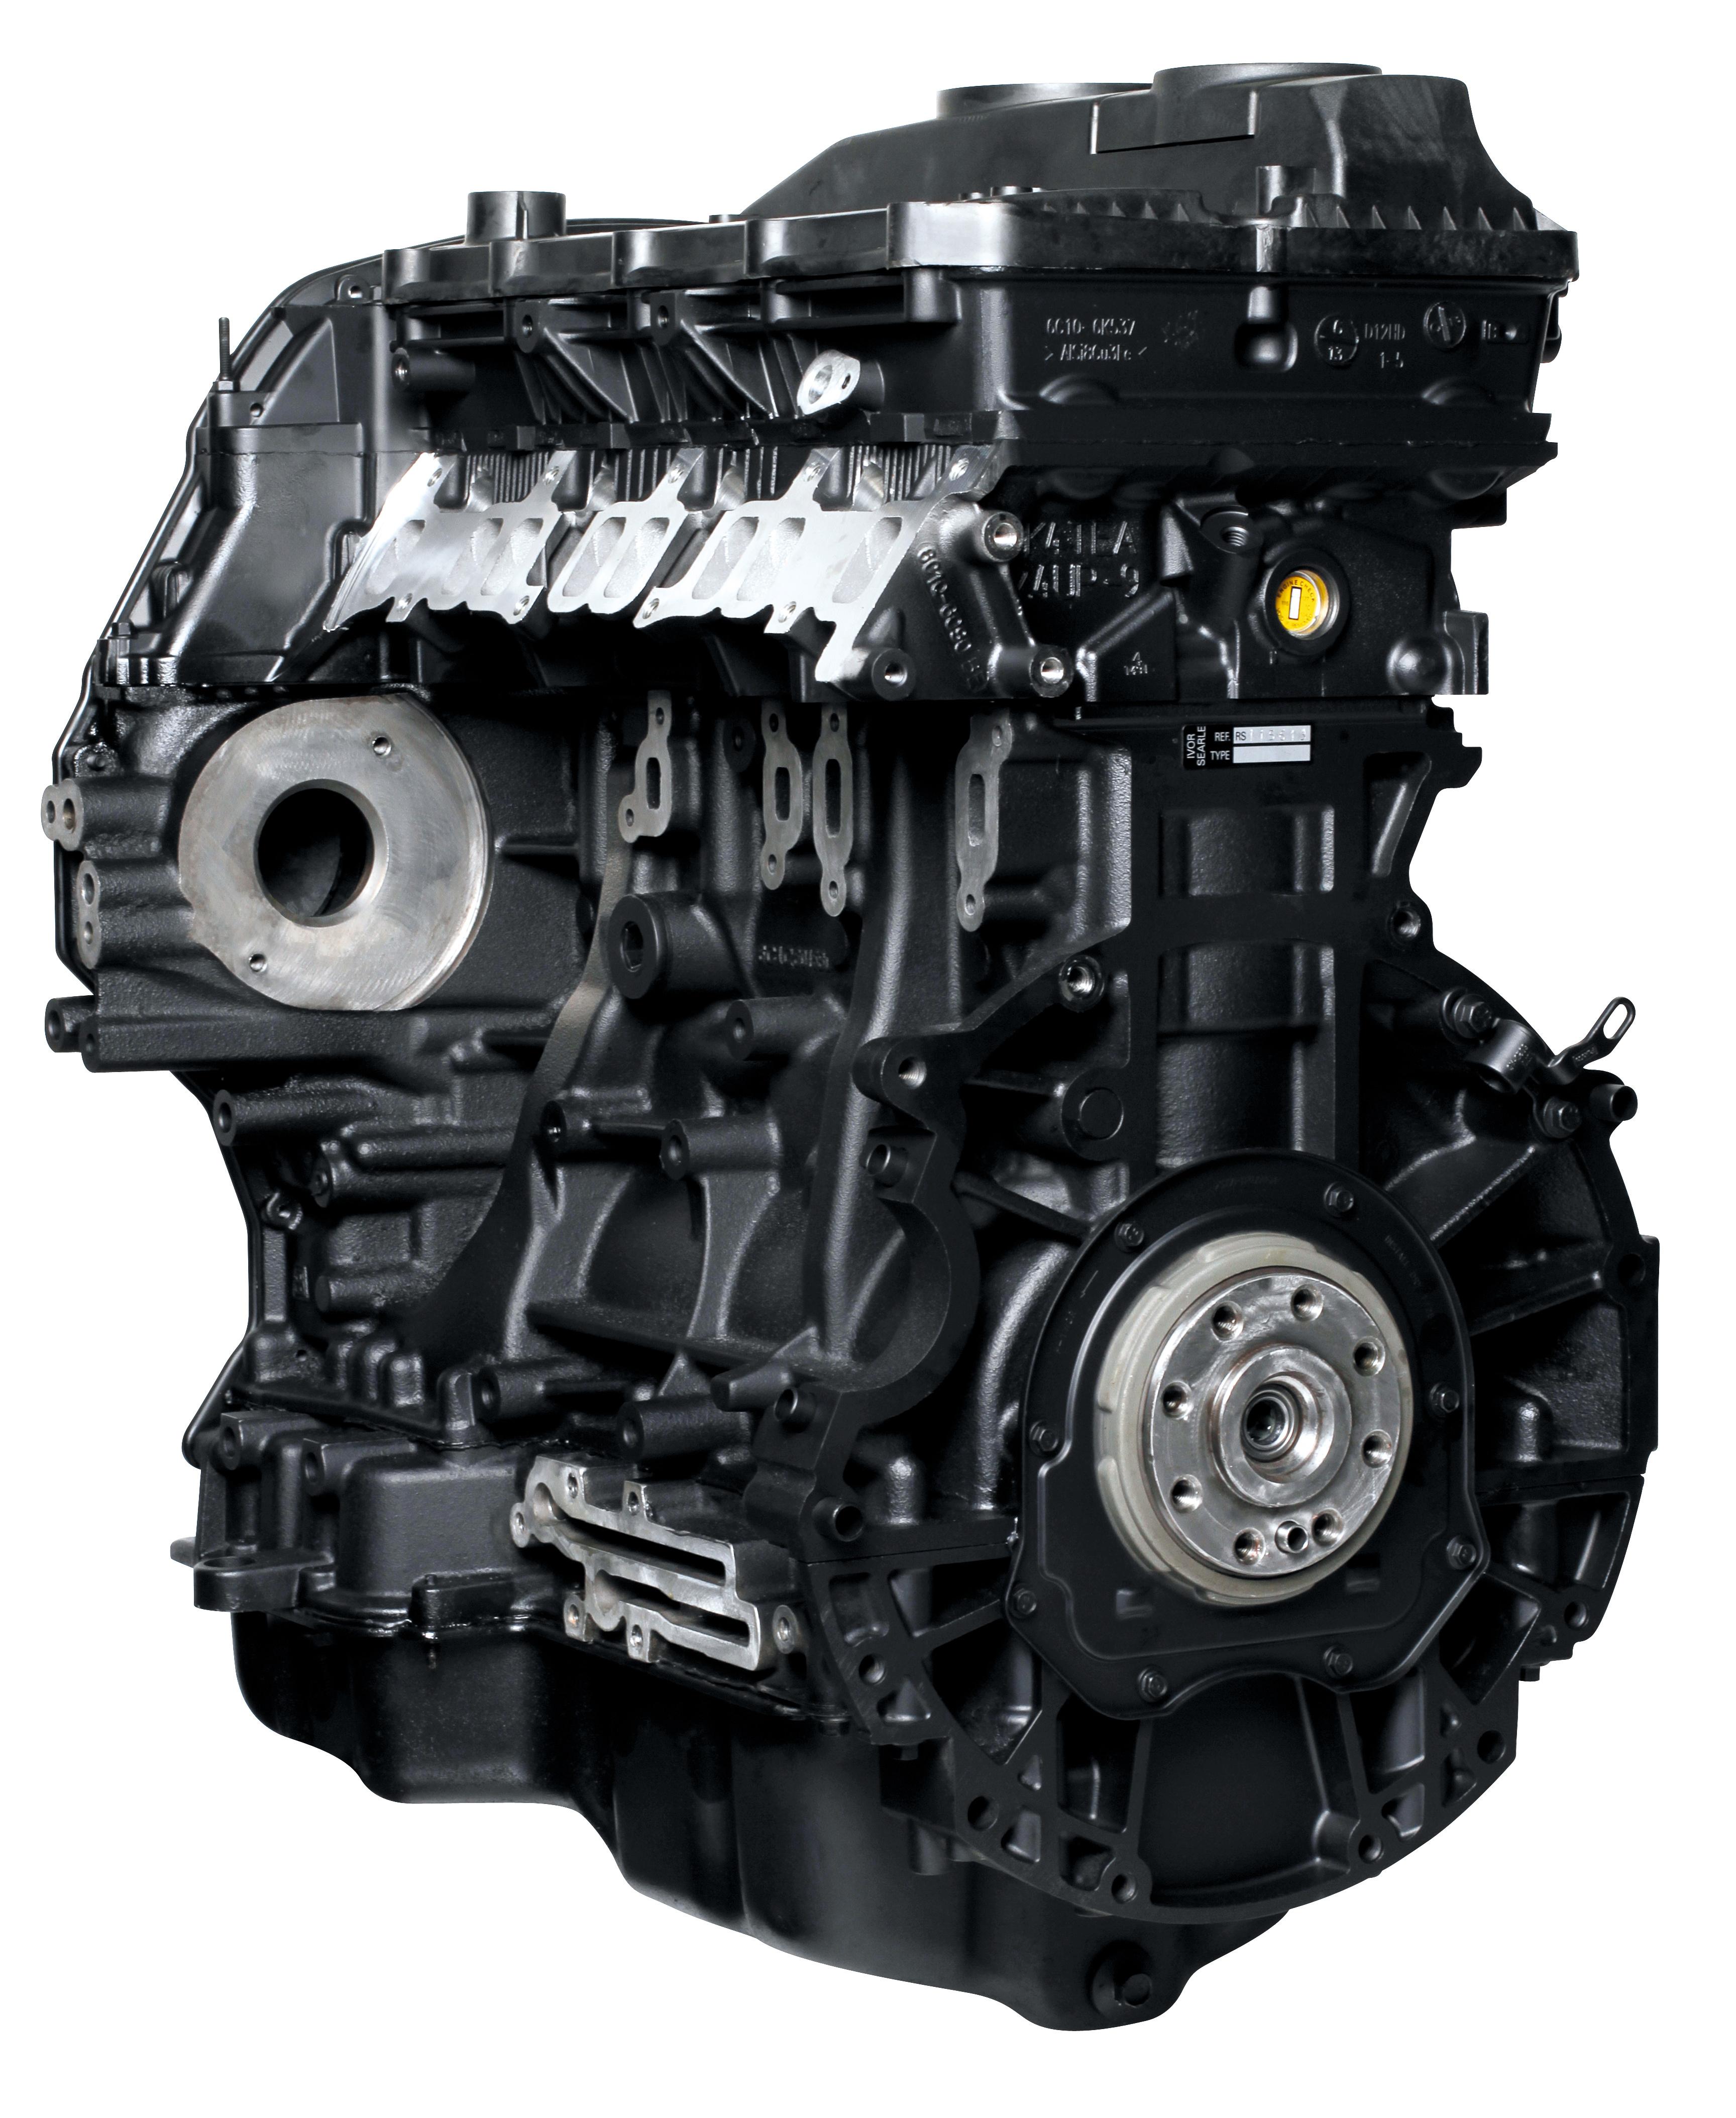 Engine1_Angle_0932